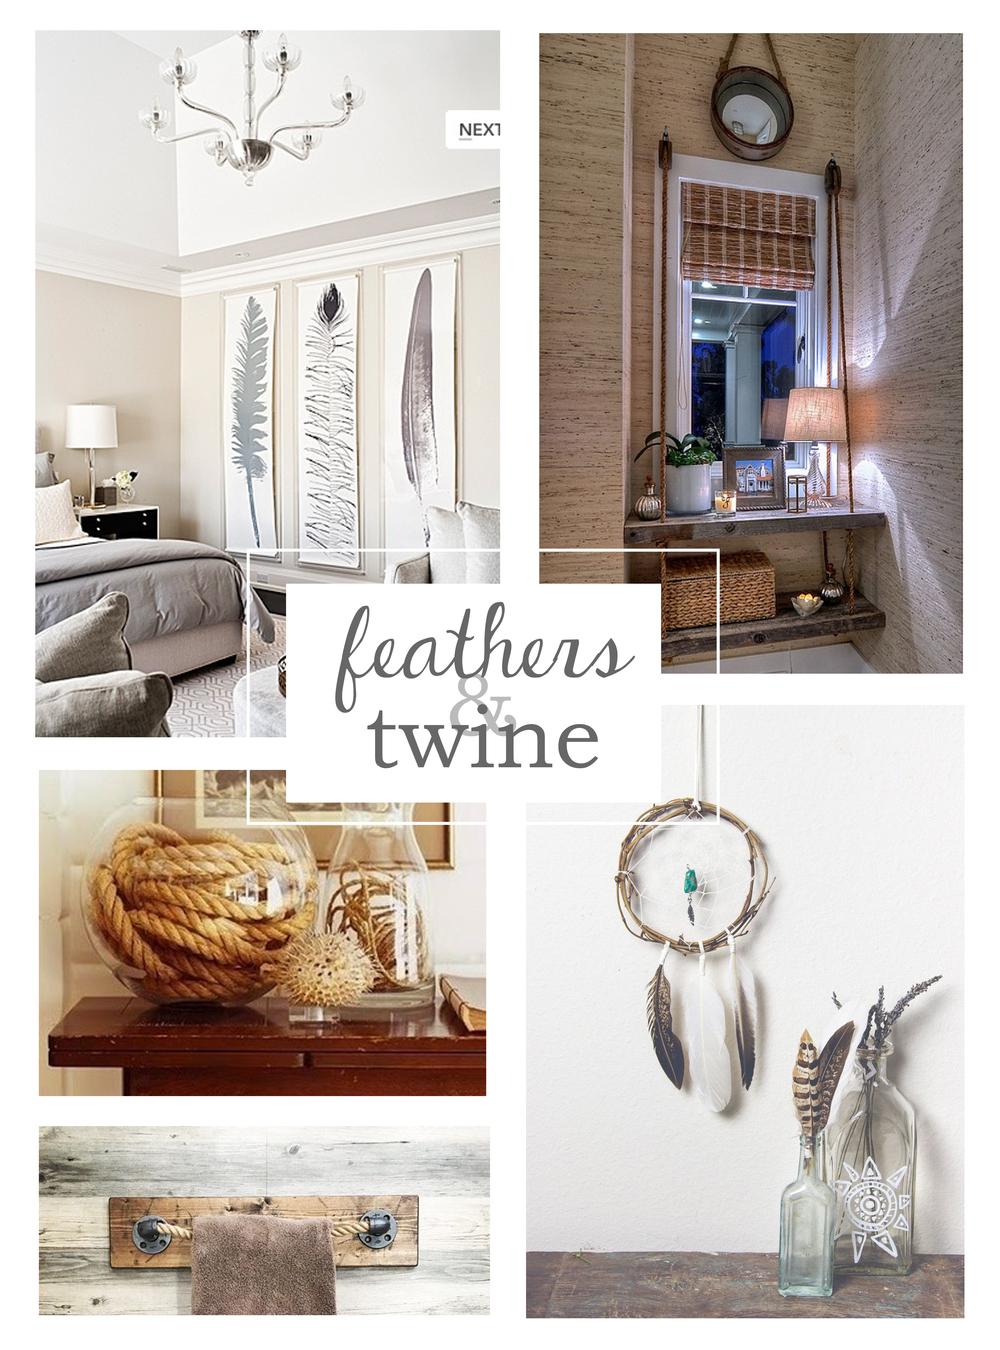 feathers-twine.jpg